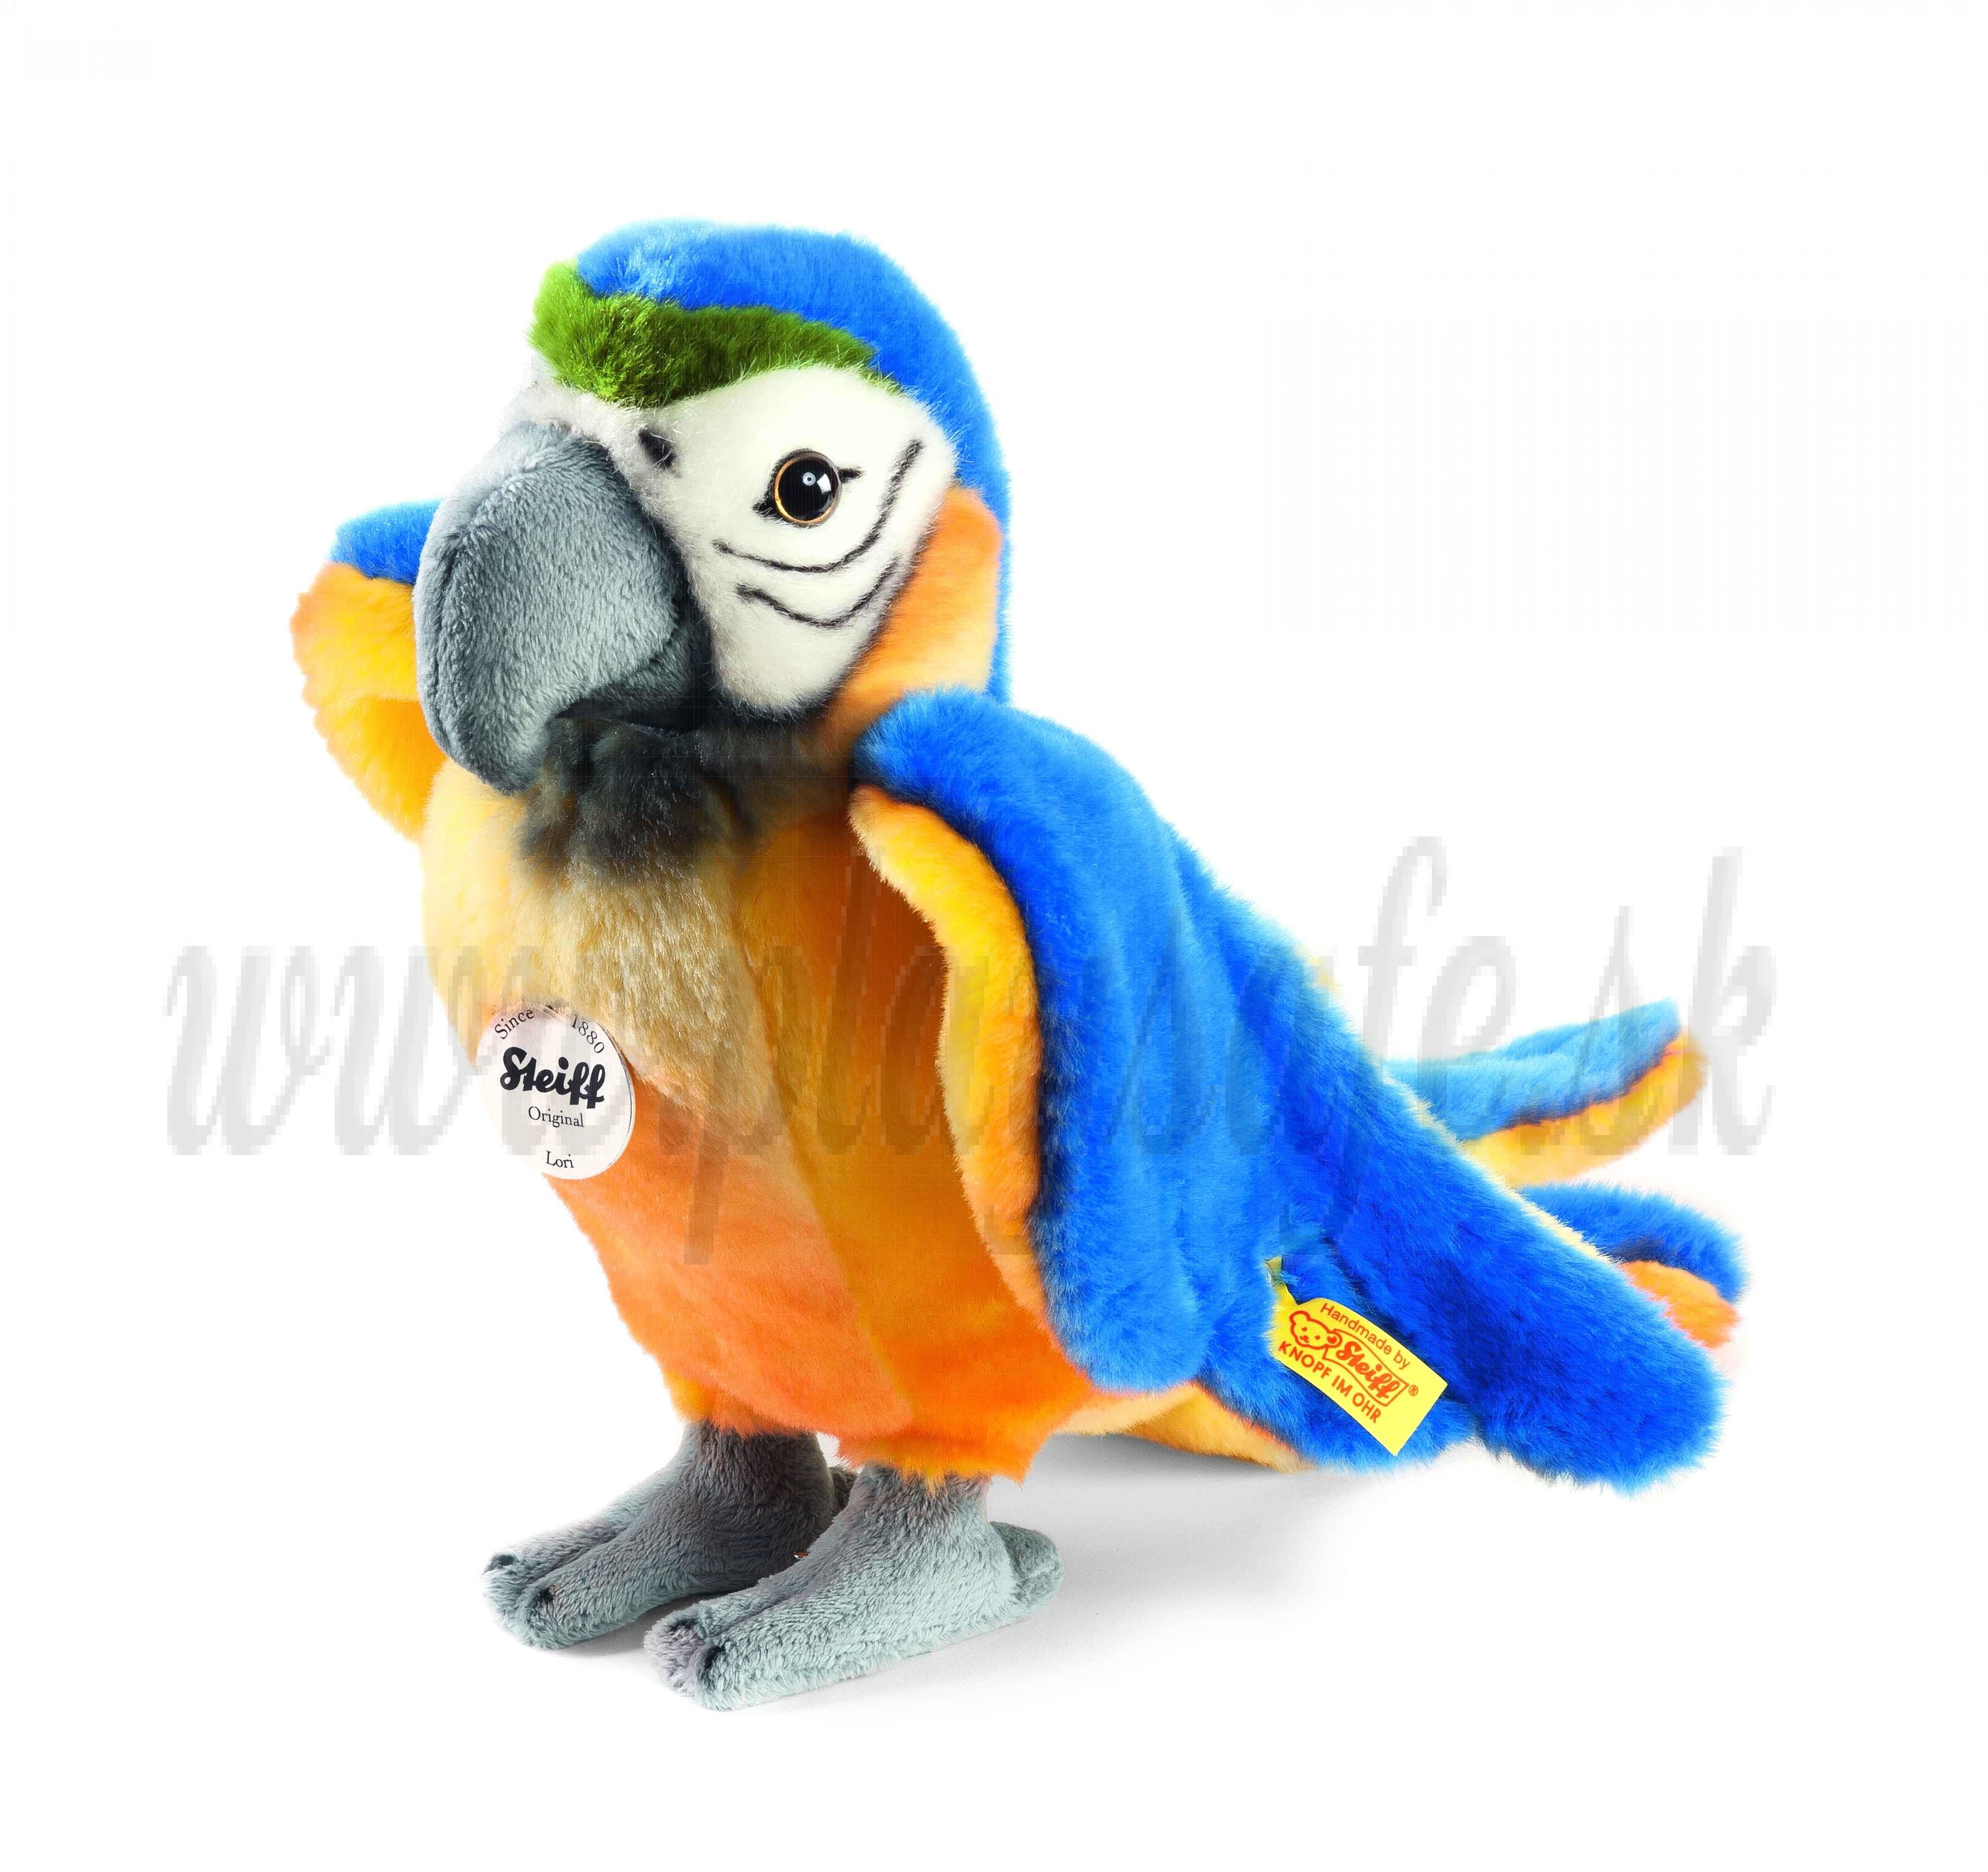 Steiff Soft toy Parrot Lori, 26cm